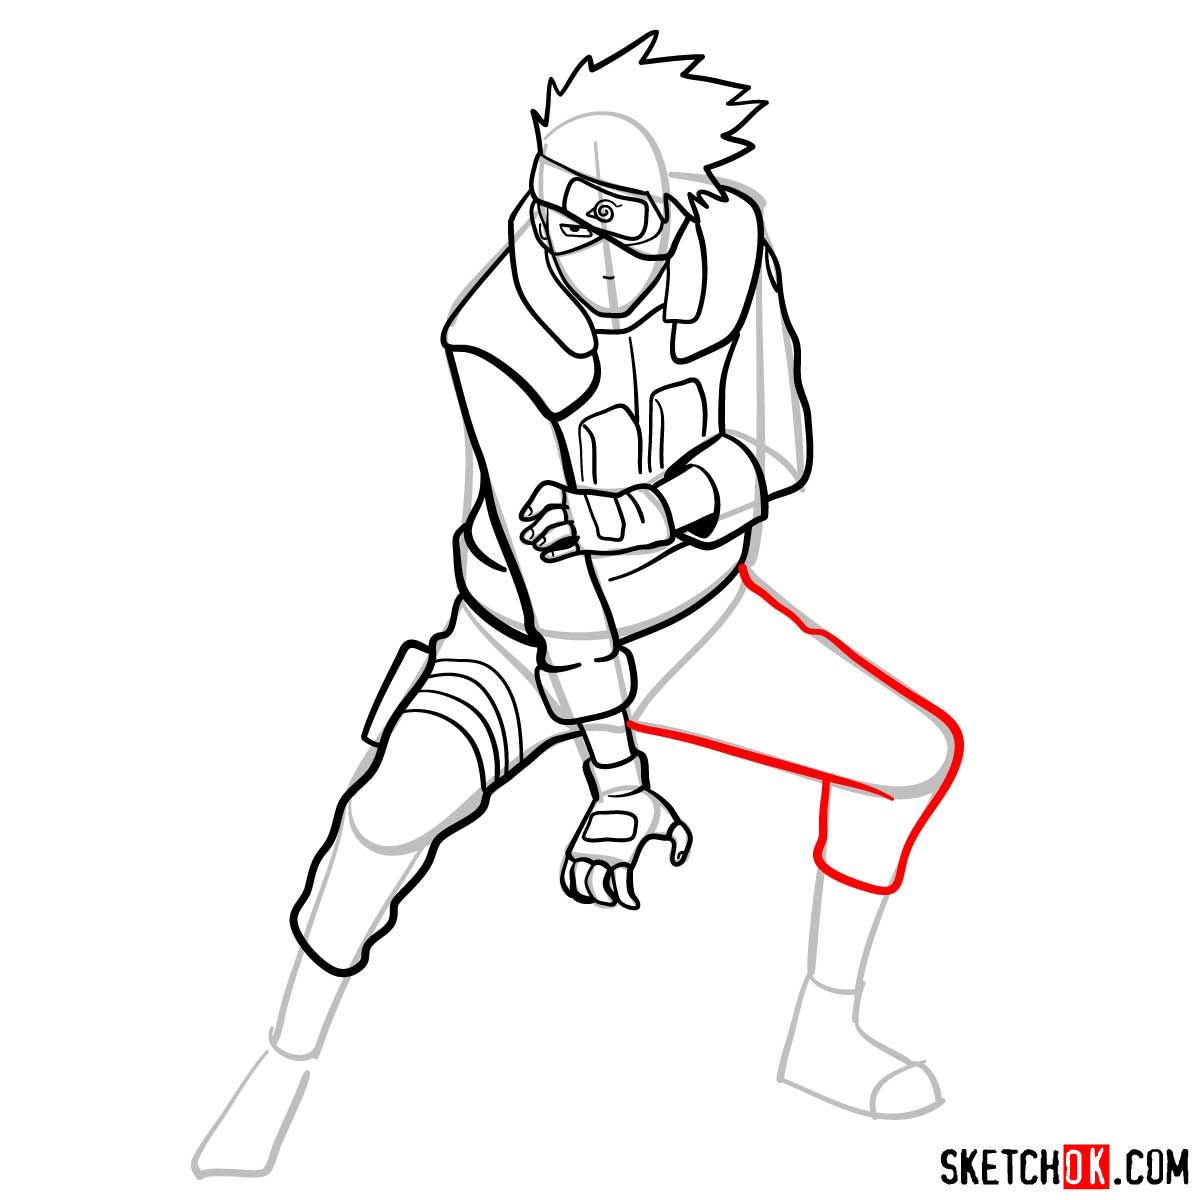 How to draw Kakashi Hatake from Naruto anime - step 12